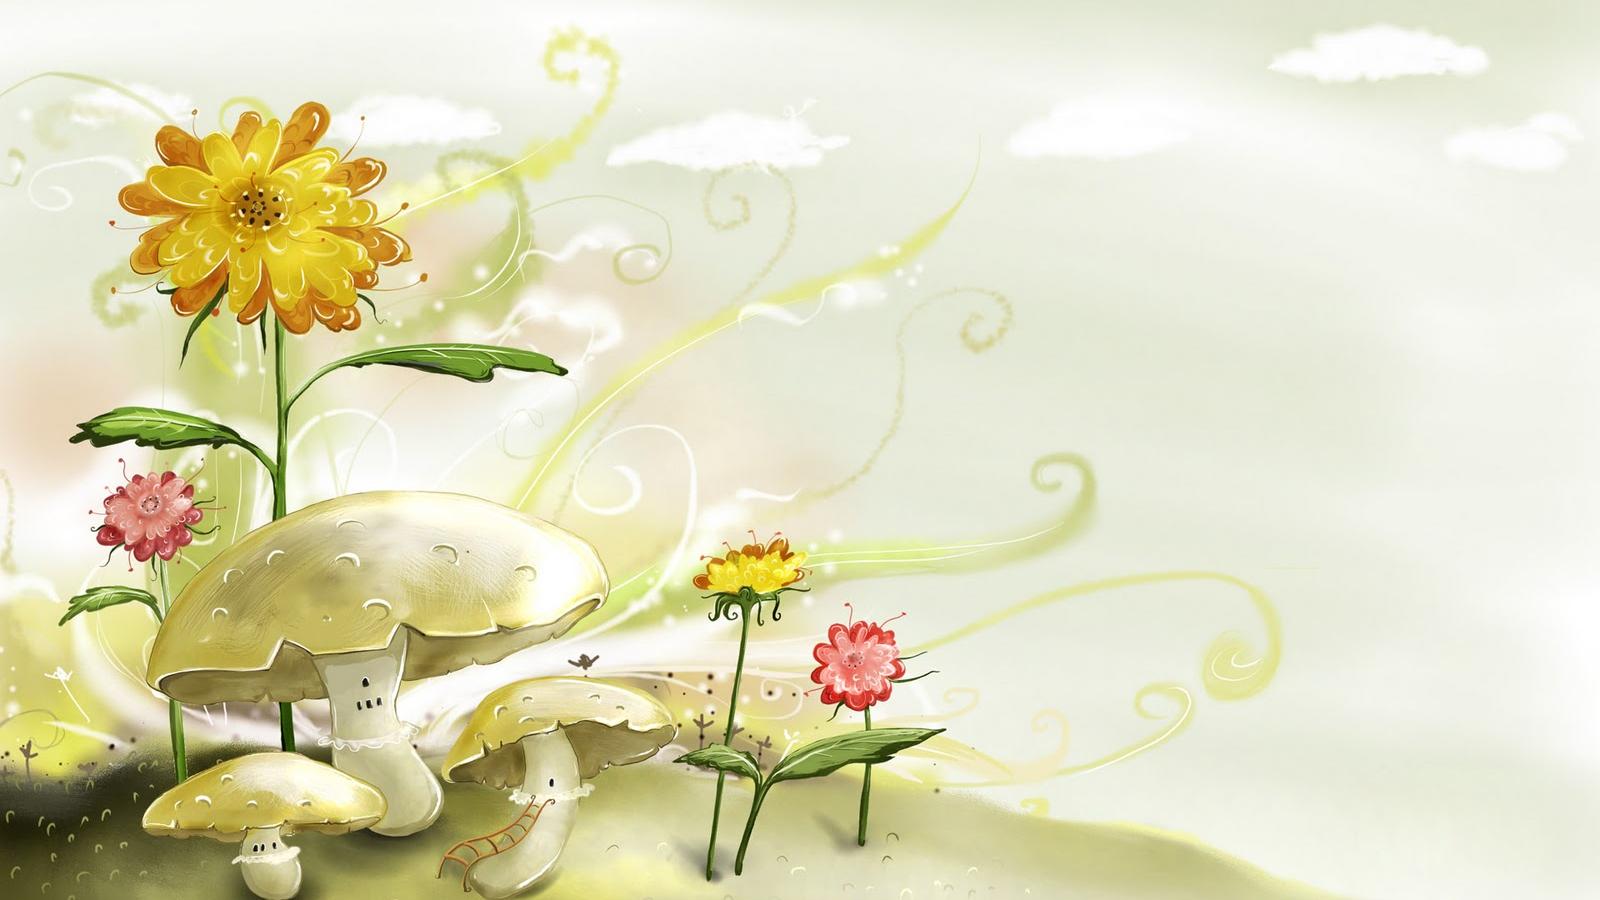 download cute spring wallpaper cute spring wallpaper cute 1600x900